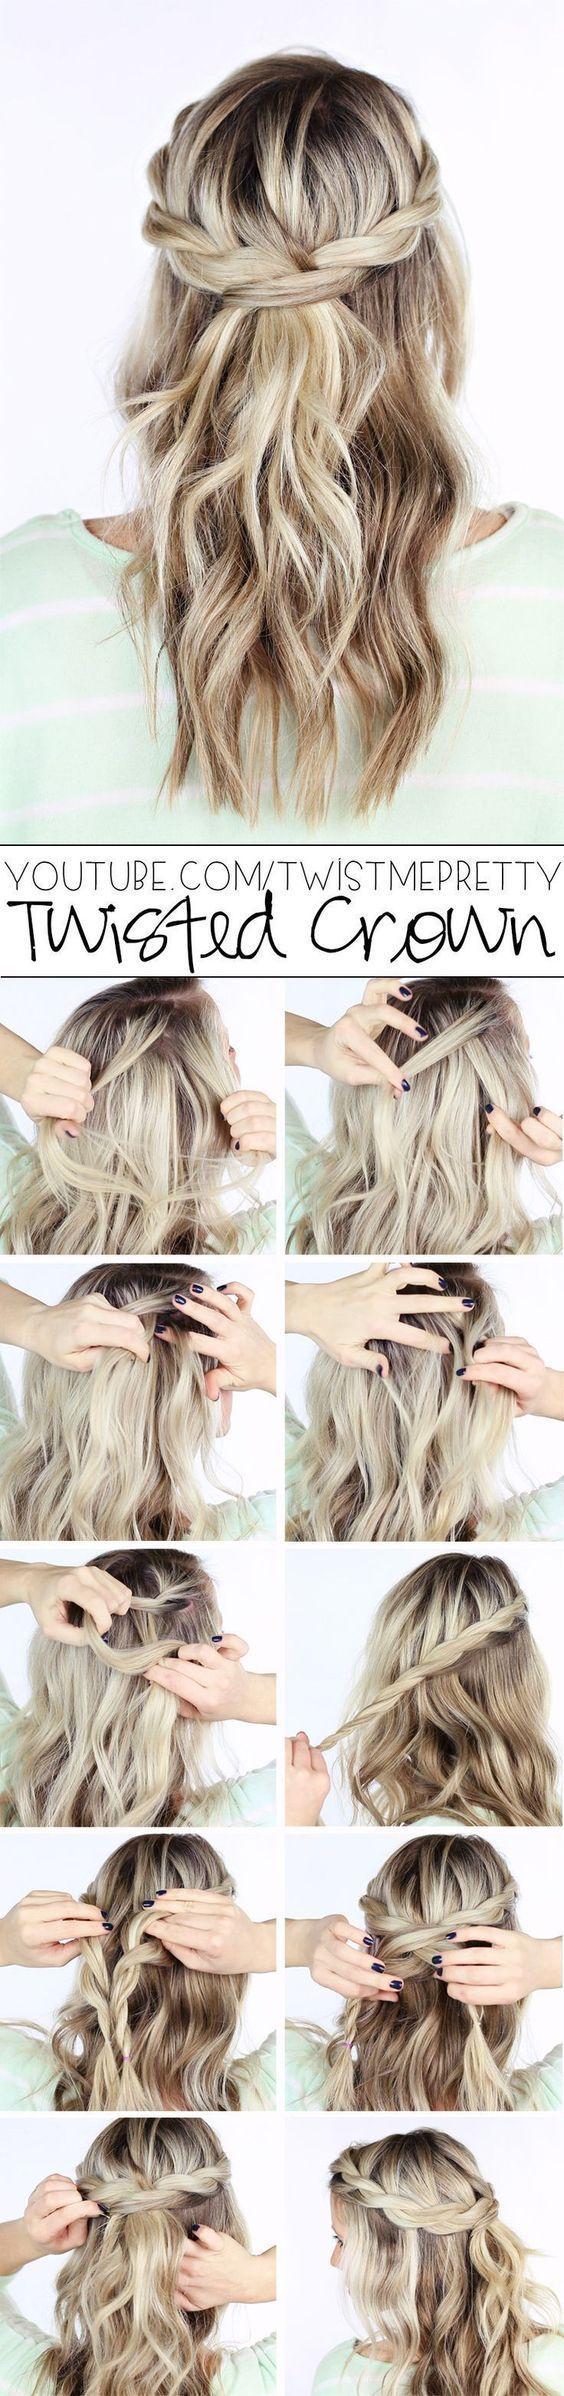 easy tutorials to make wedding hair crown braids hair style